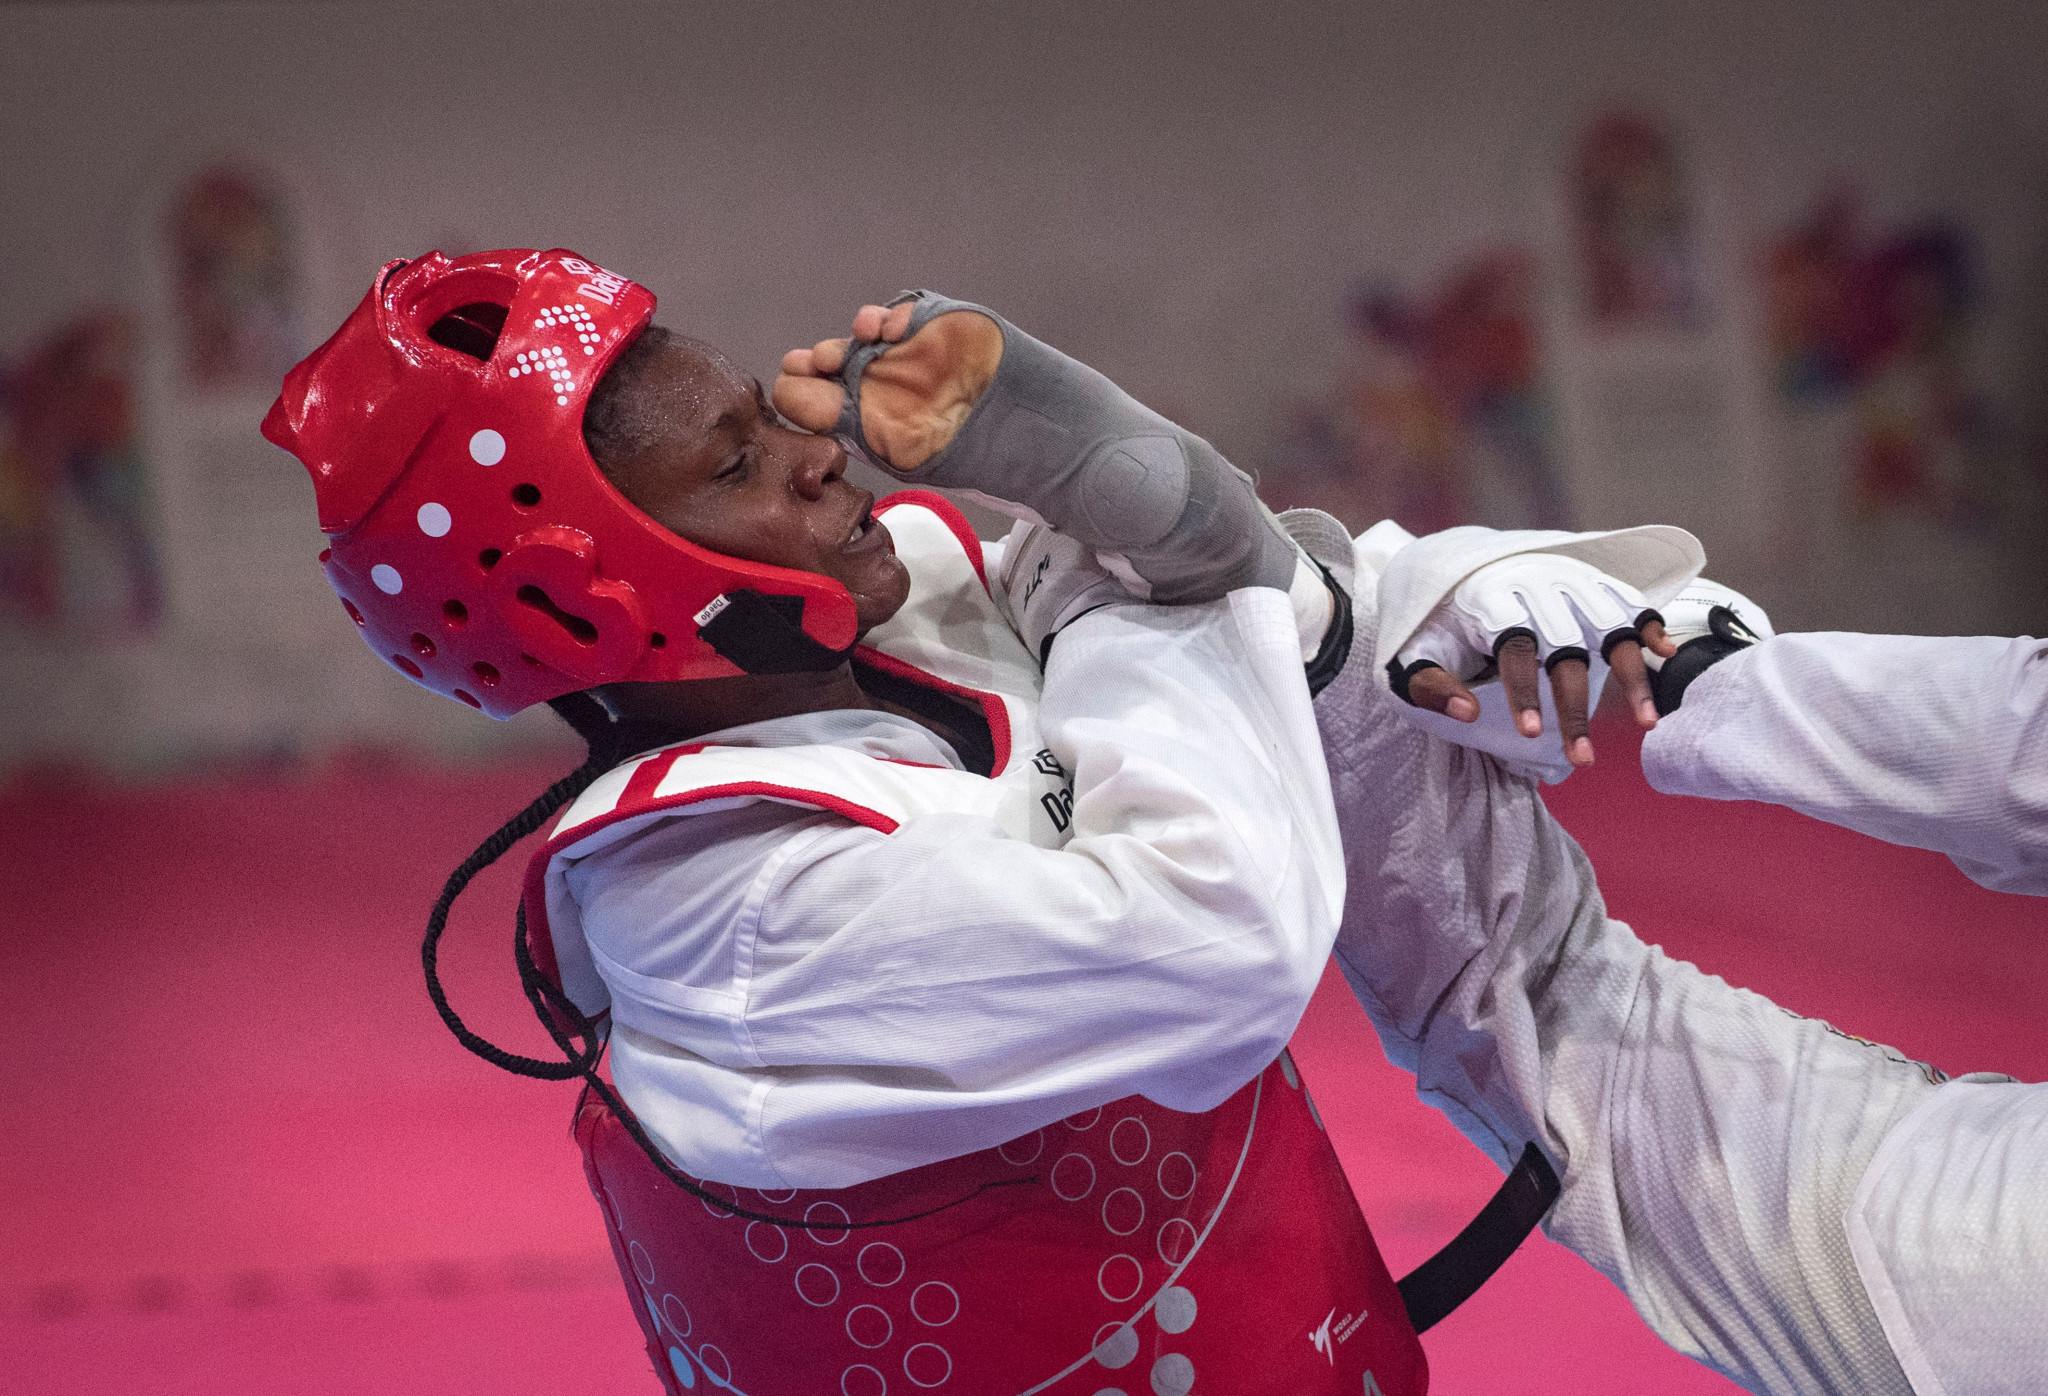 Kenya Taekwondo Federation President targets more Tokyo 2020 berths and Dakar 2022 success